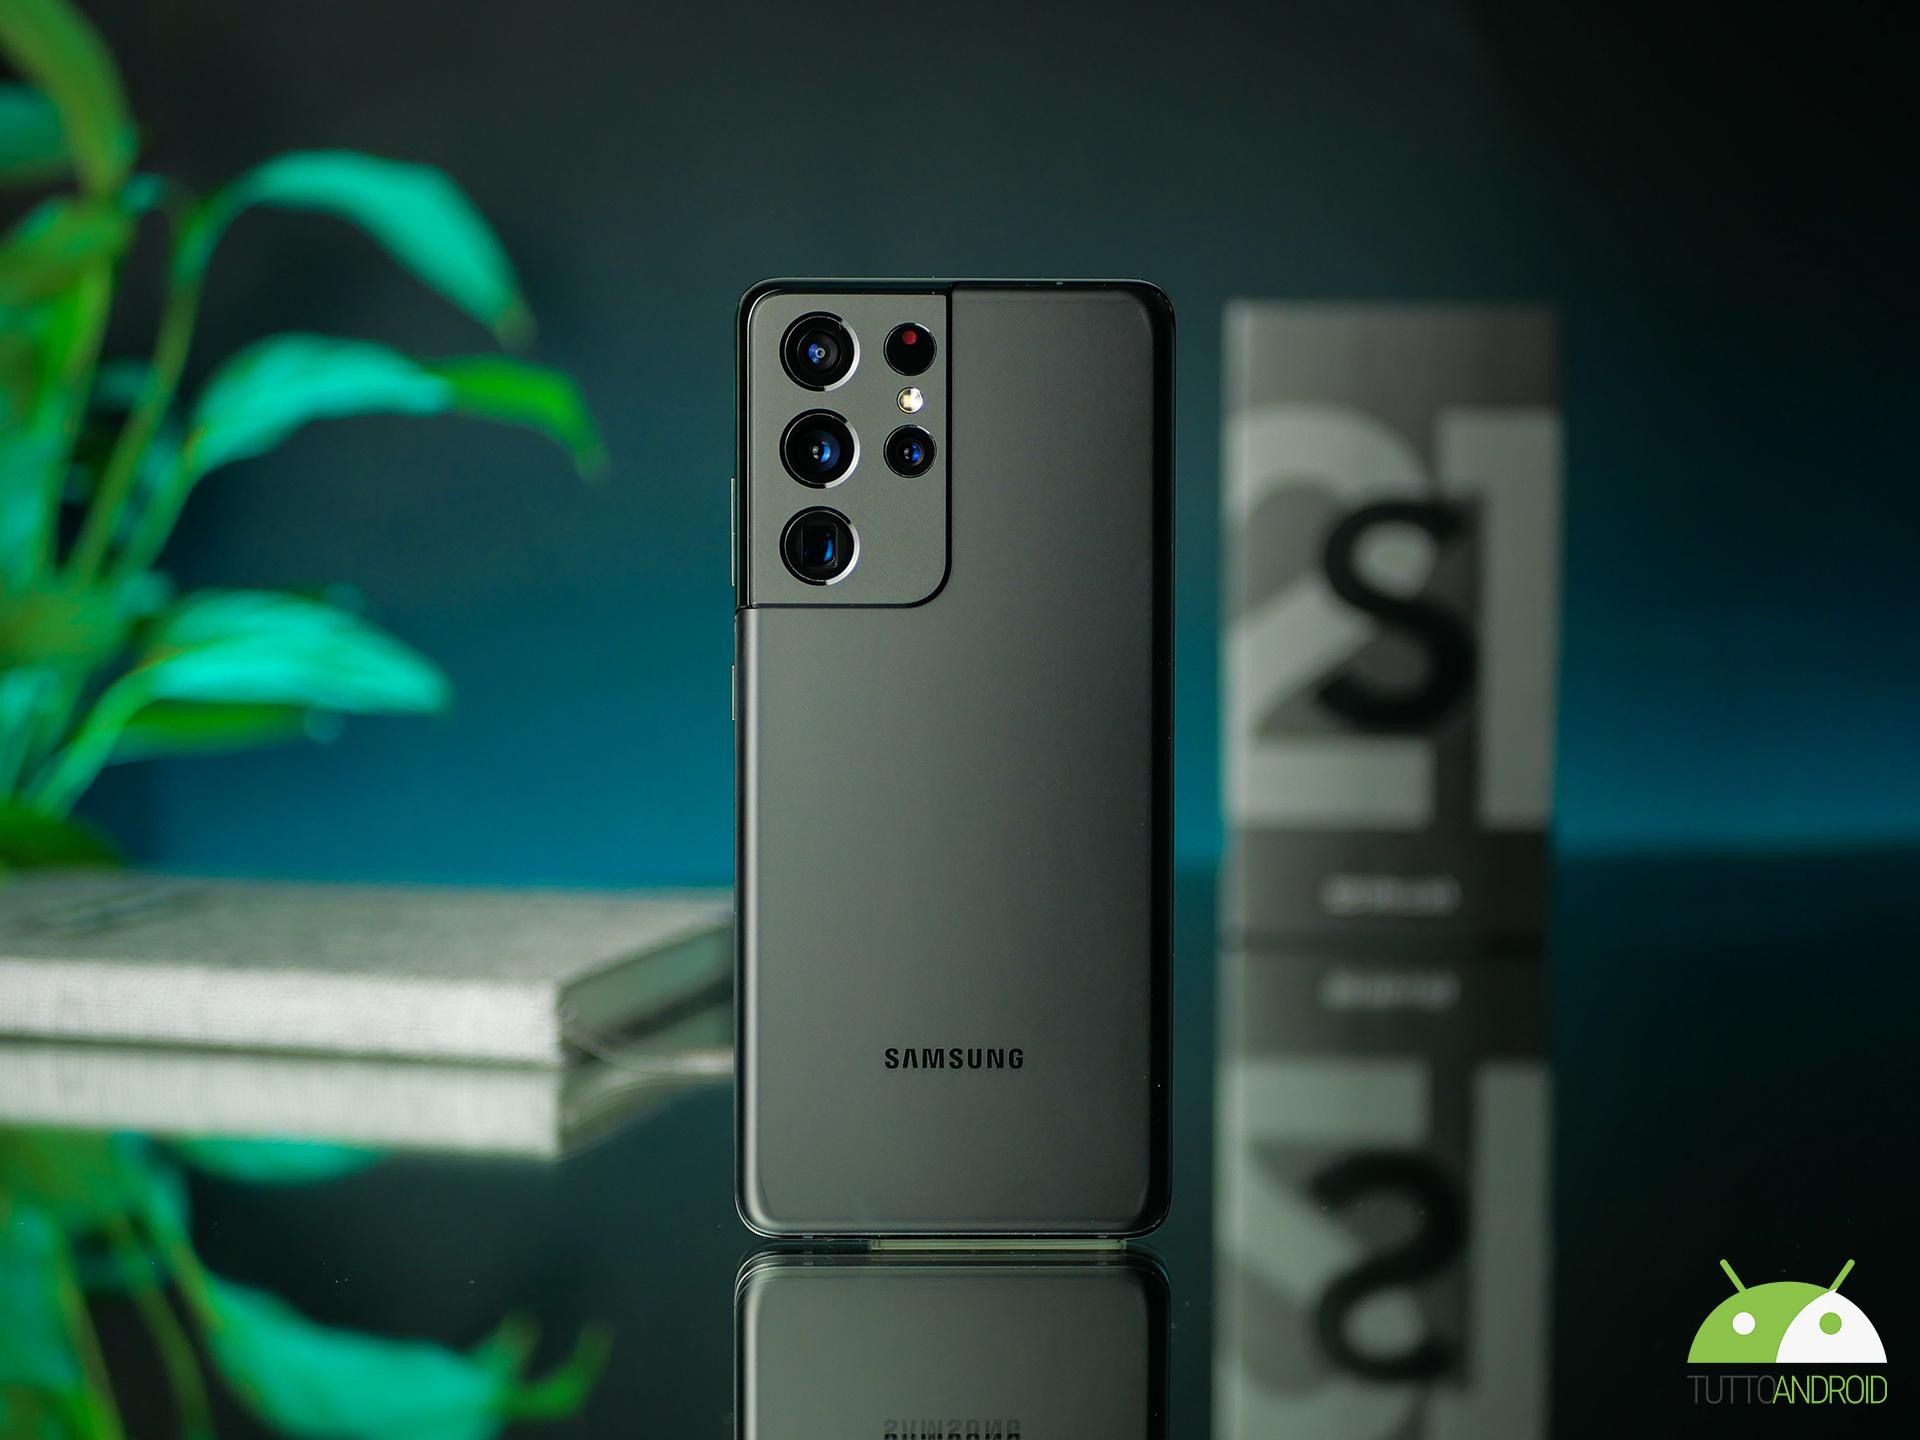 Samsung Galaxy S21 è già in offerta su MediaWorld in tutte le varianti